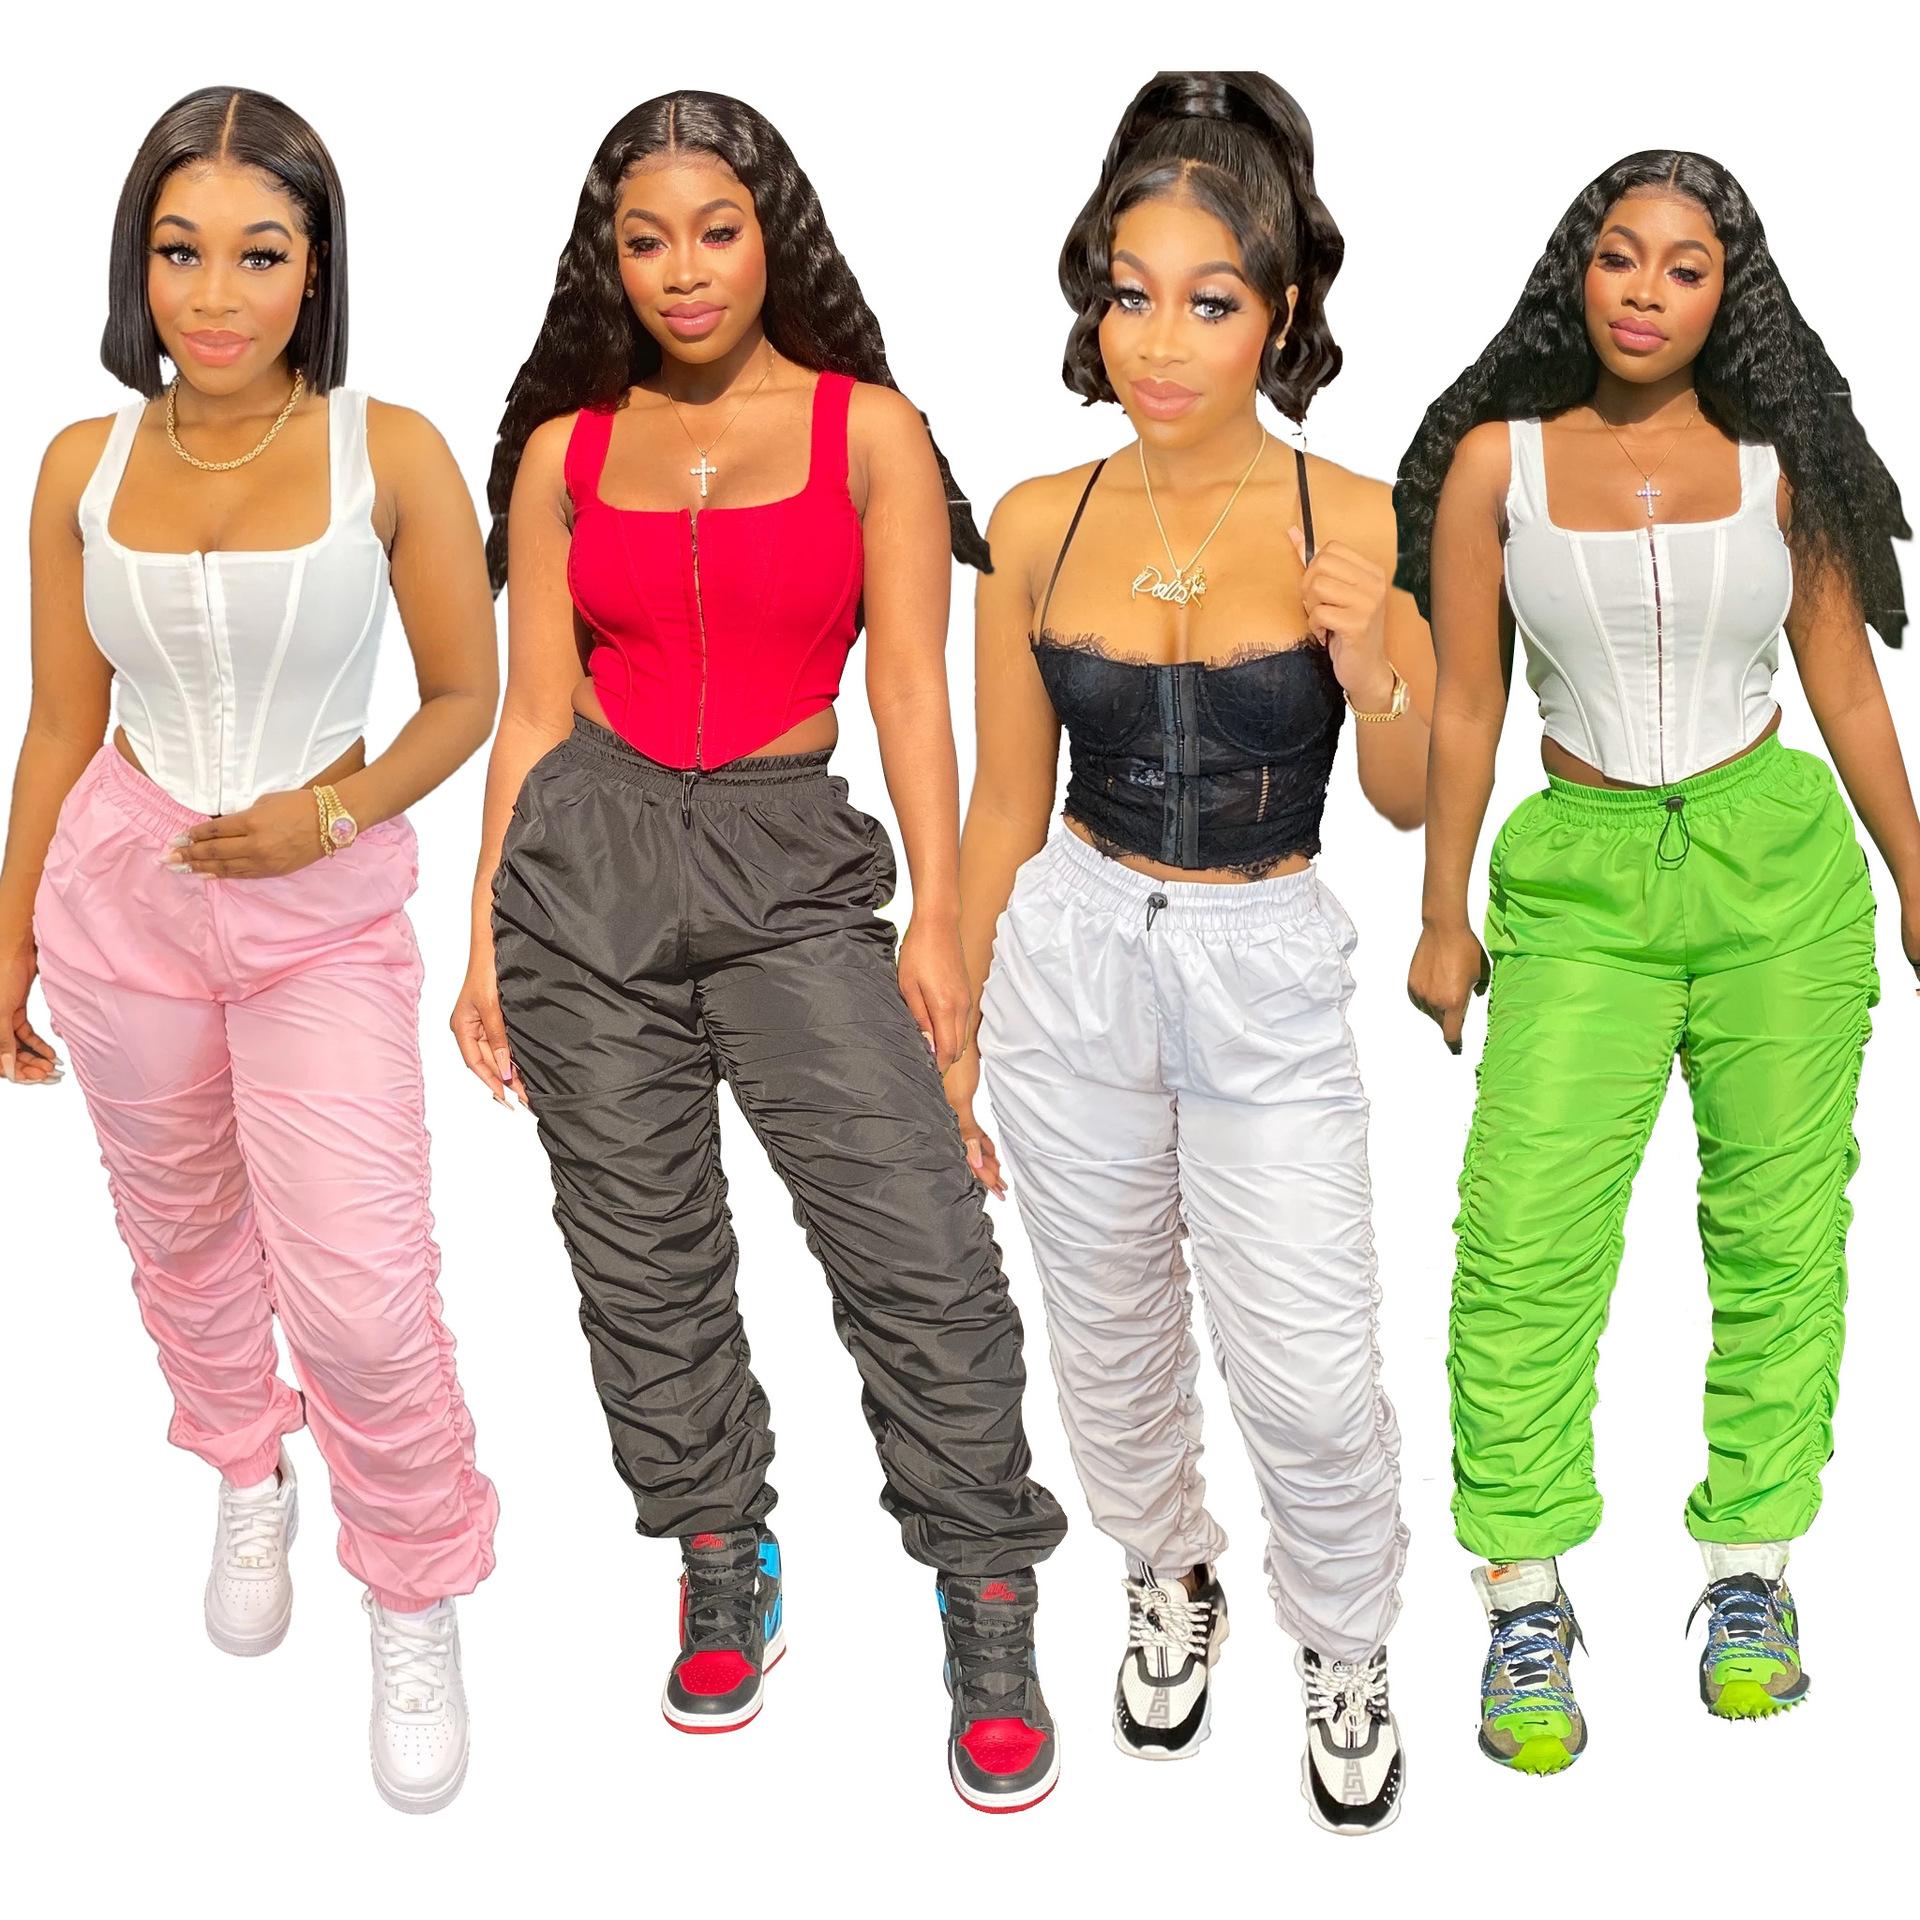 2020 Pantalon De Moda Las Mujeres De Pantalones Harem Qzbaoshu Deporte Legging Impermeable Apilado Pantalones Buy Pantalones Apilados Pantalones De Moda Para Mujer Pantalones Harem Para Mujer Product On Alibaba Com